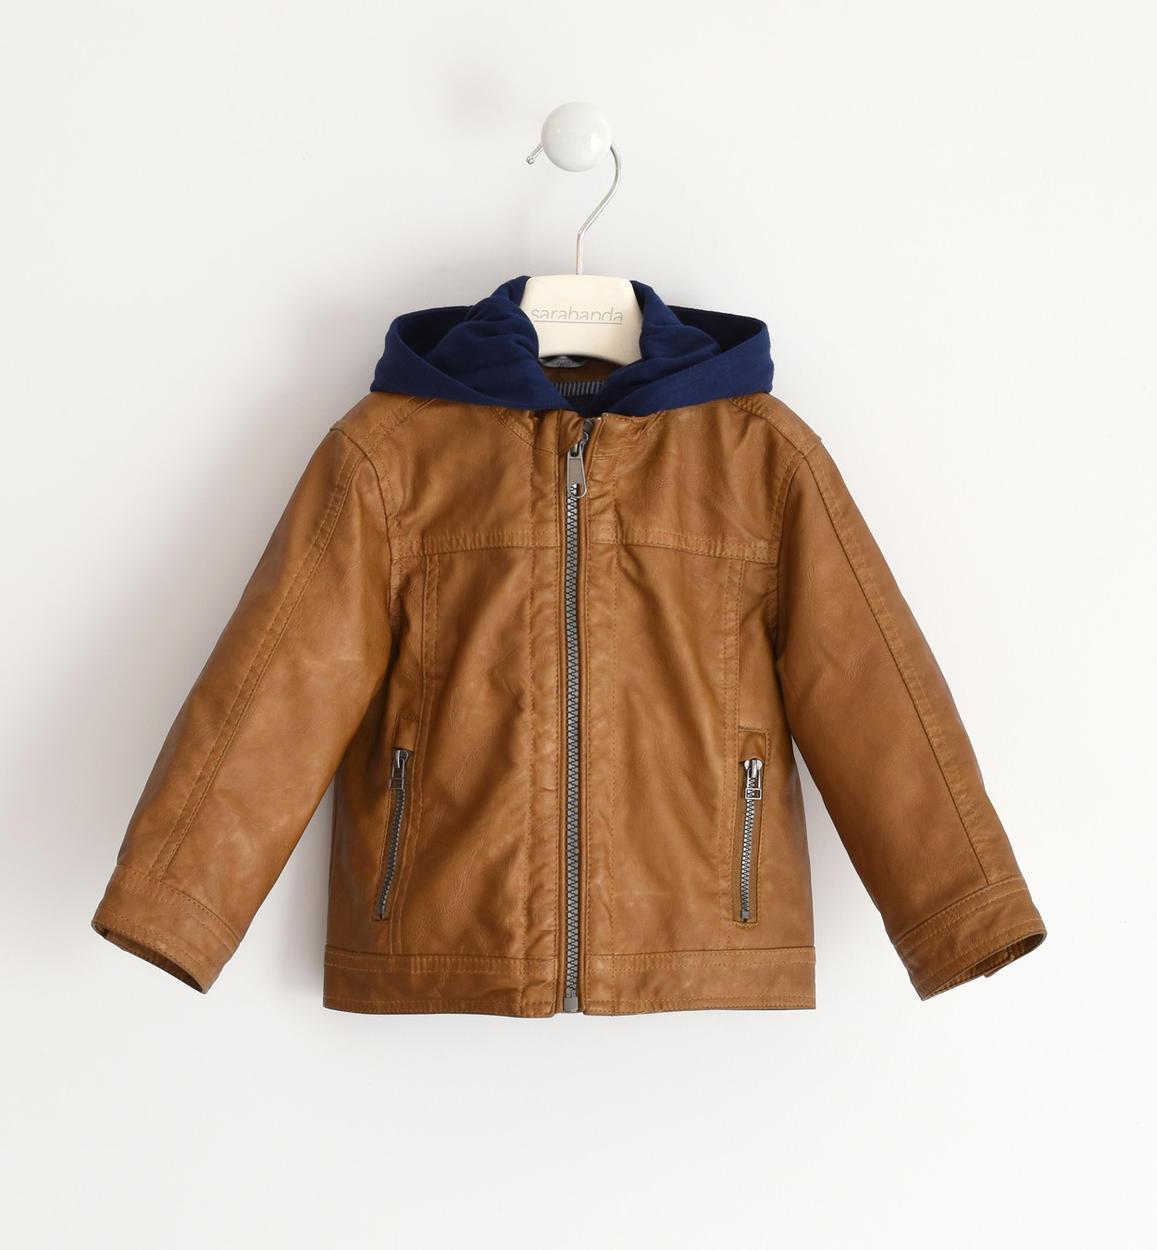 barna fiú bőrkabát dzseki